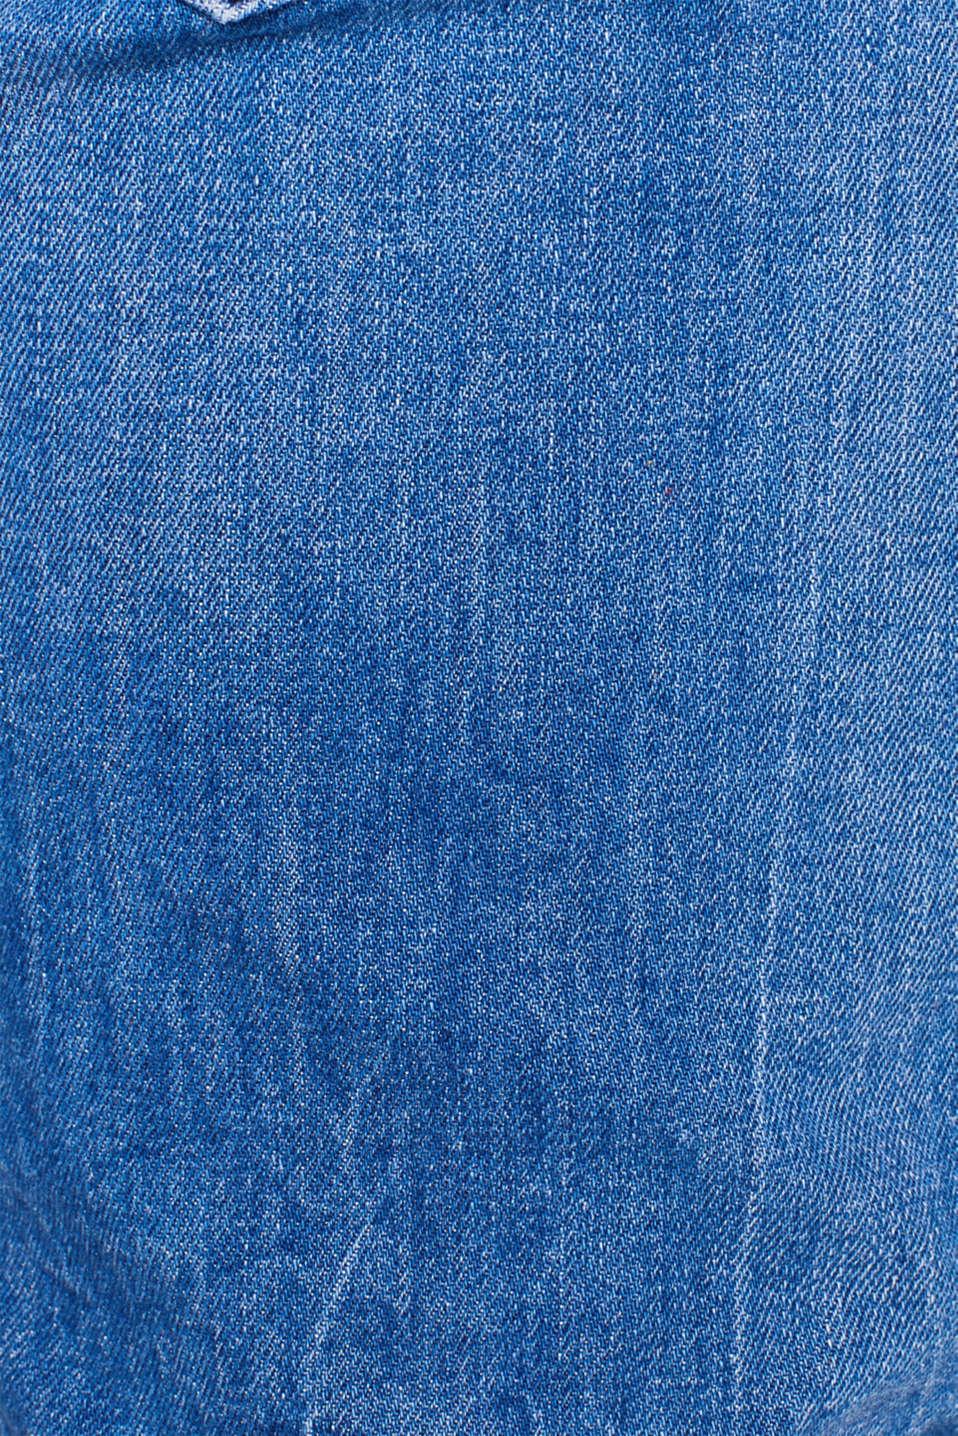 Pants denim, BRIGHT BLUE, detail image number 4